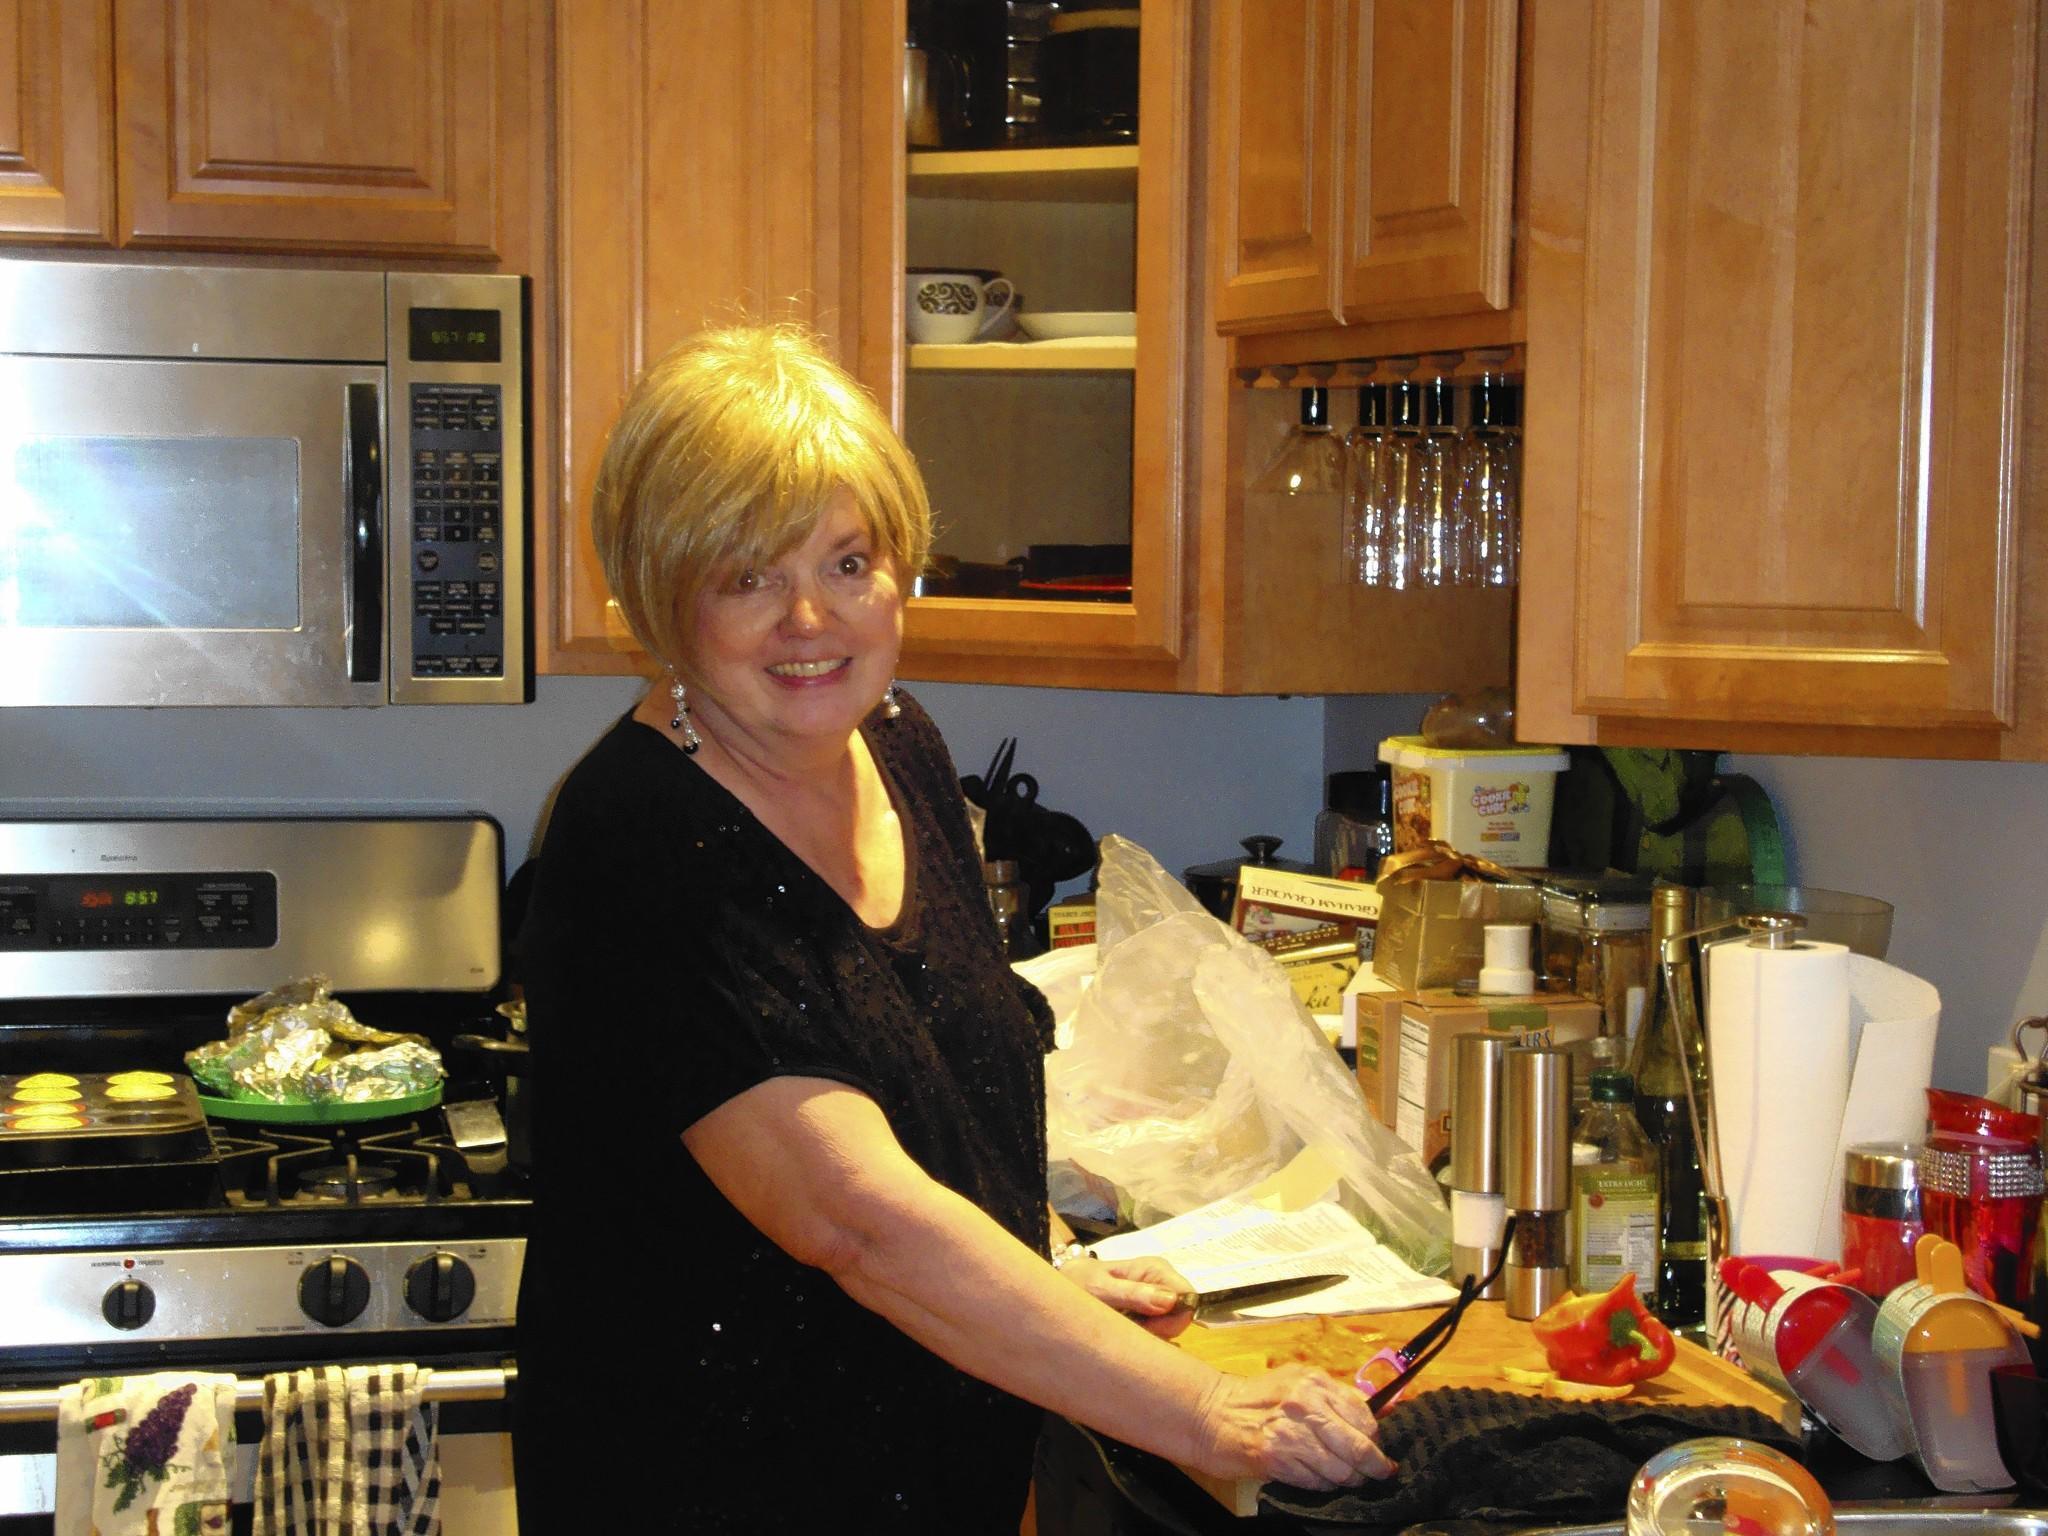 Suzanne B. Asa taught Spanish at Eisenhower Junior High School in Darien for 34 years.